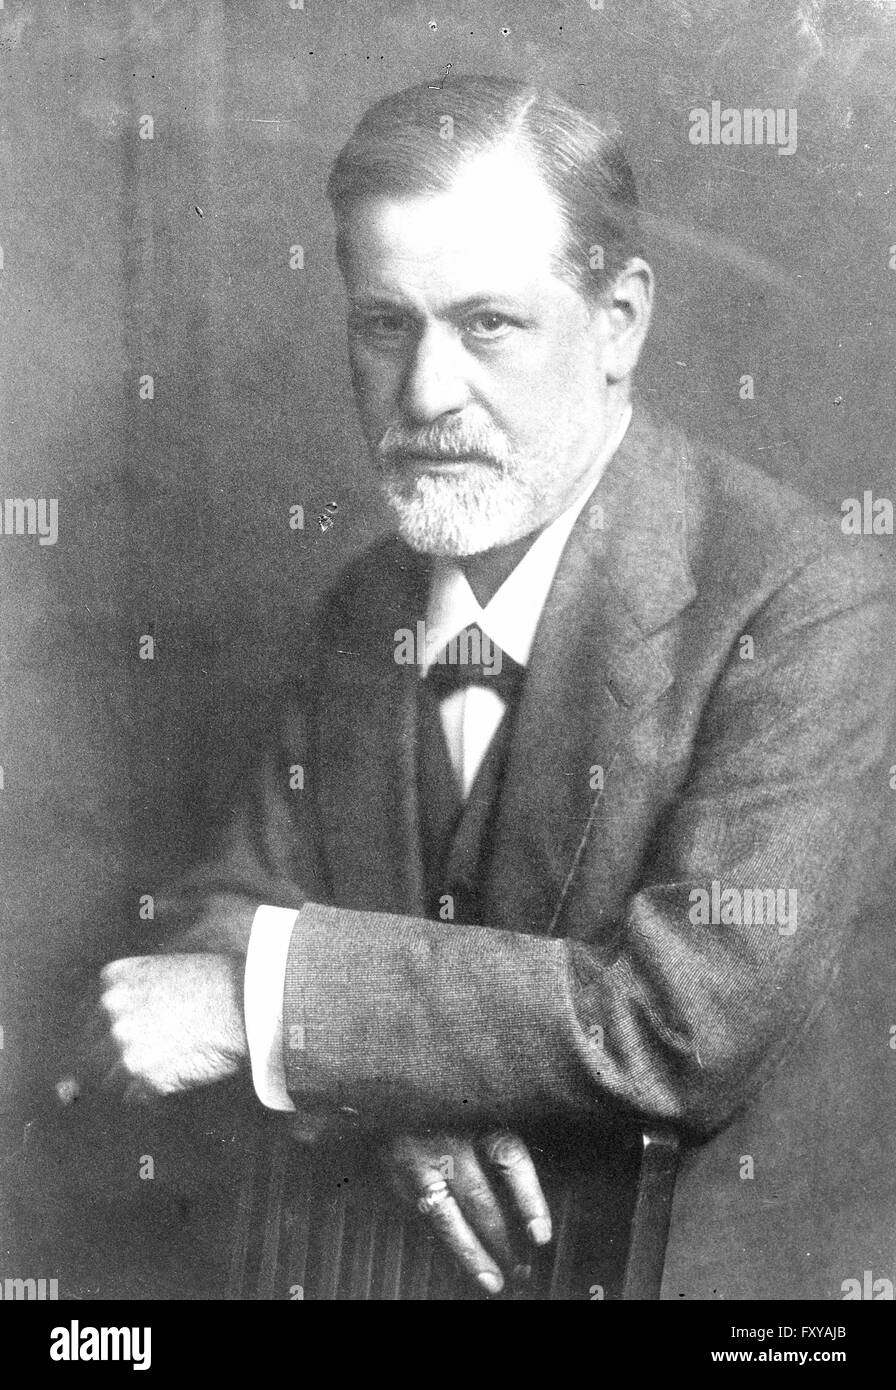 Sigmund Freud - Stock Image